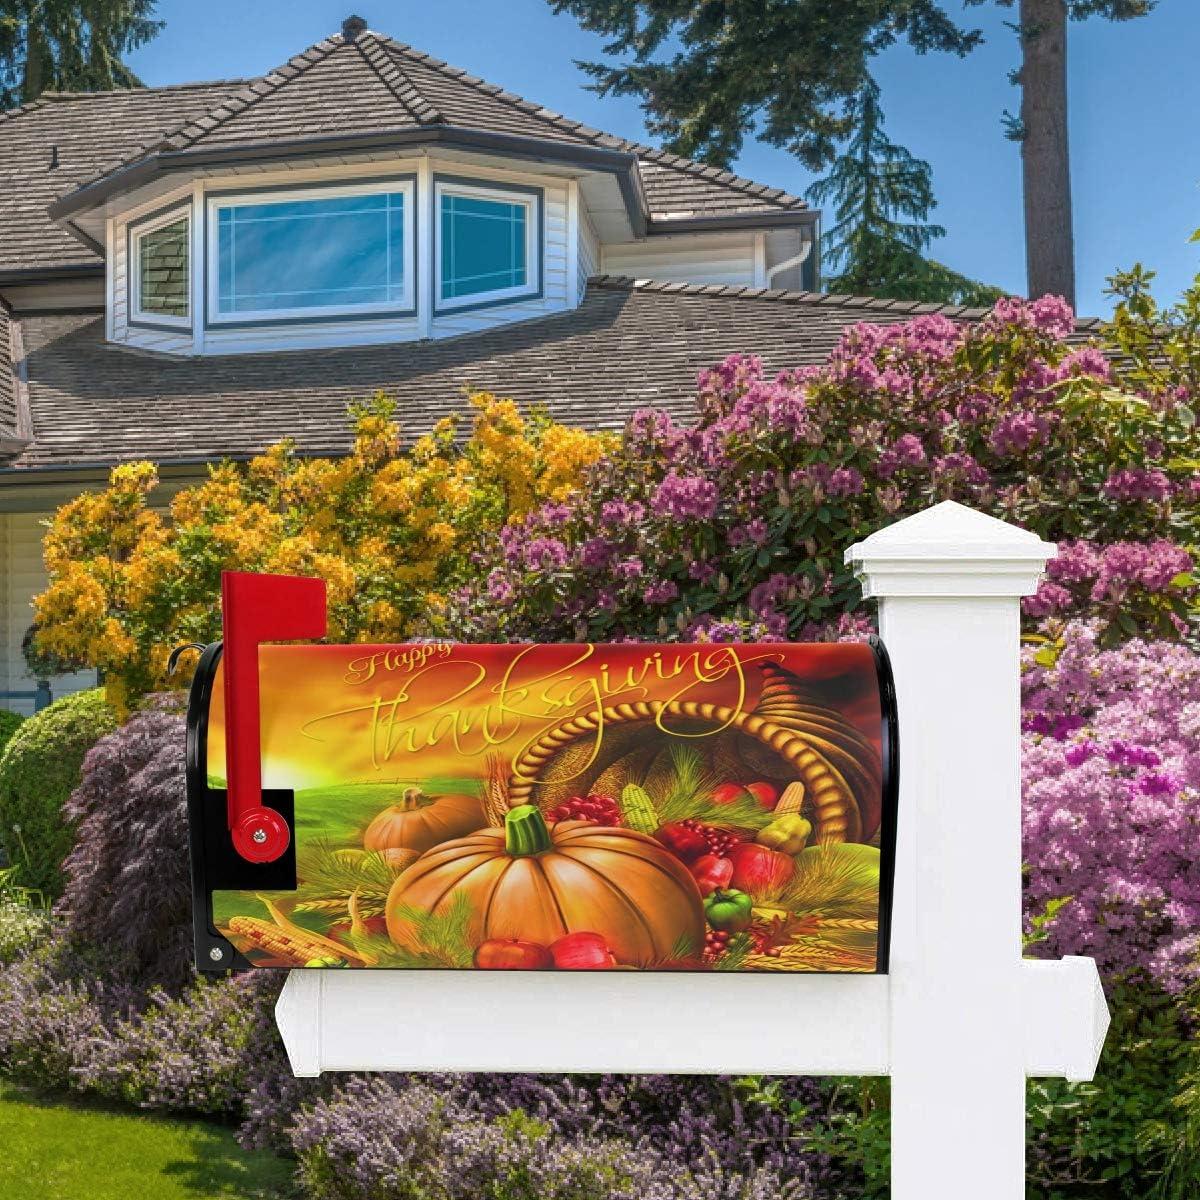 Oarencol American Flag Baseball Glove Mailbox Covers Magnetic Patriotic American Star Stripel Garden Yard Home Decor Standard Size 21 x 18